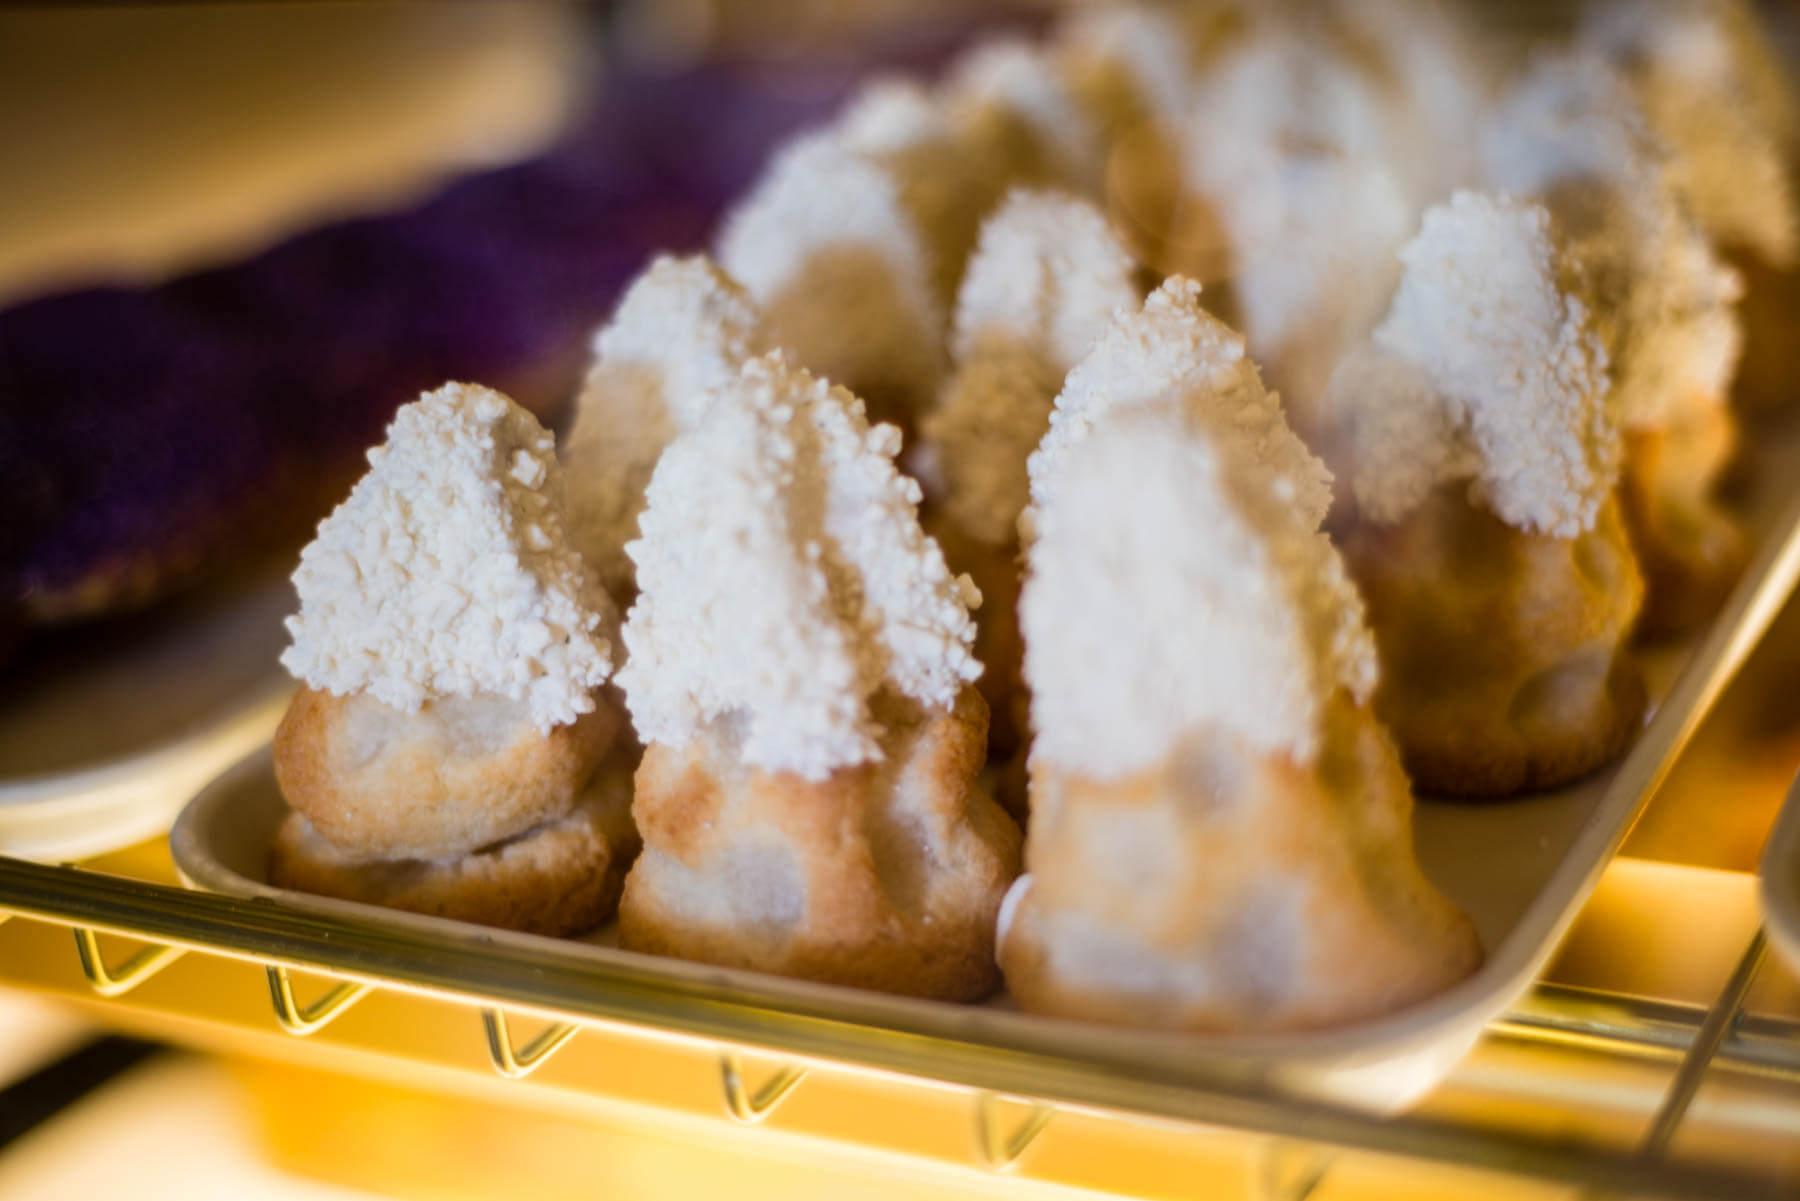 Tray of Matterhorn Macaroon's from Jolly Holiday Bakery Disneyland